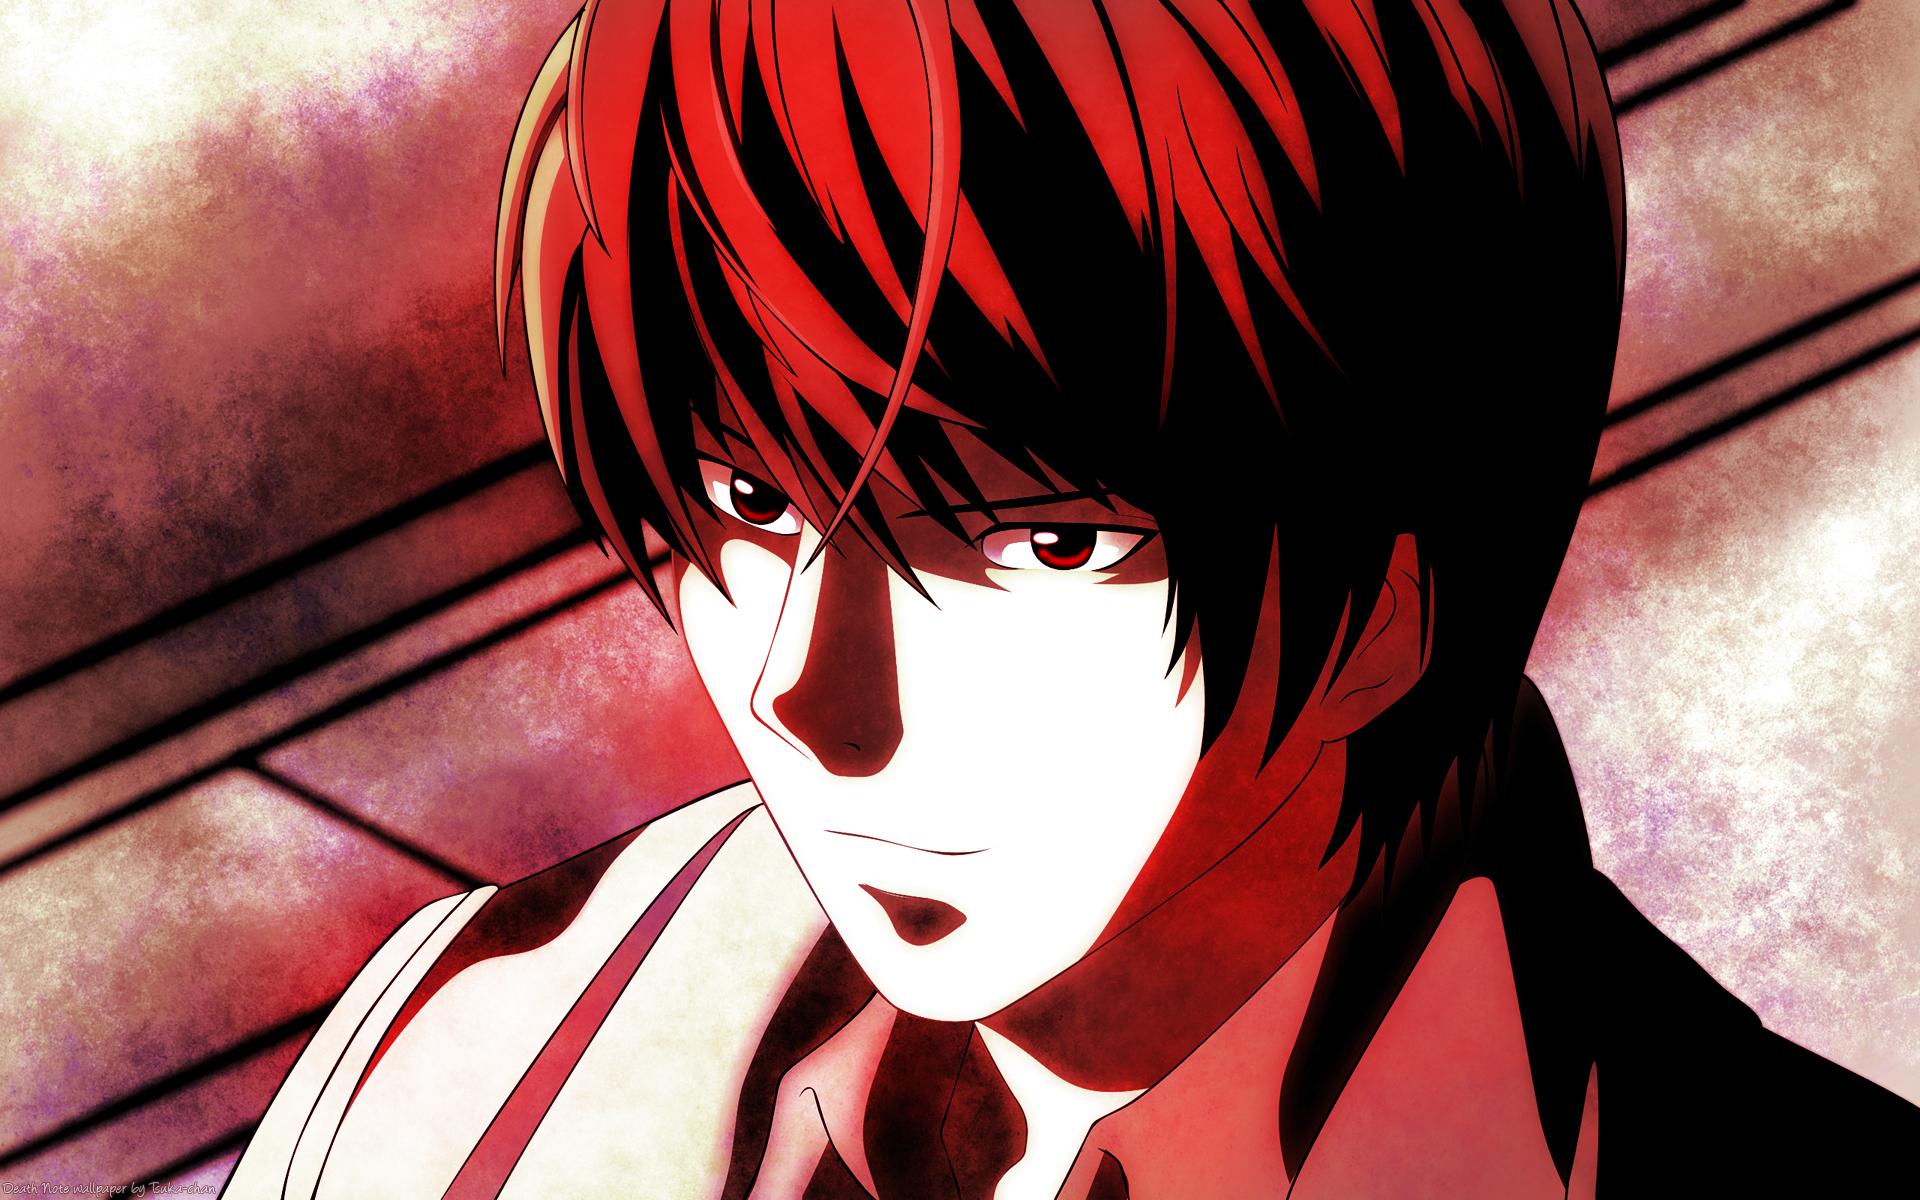 death note wallpaper,hair,face,red,anime,cartoon